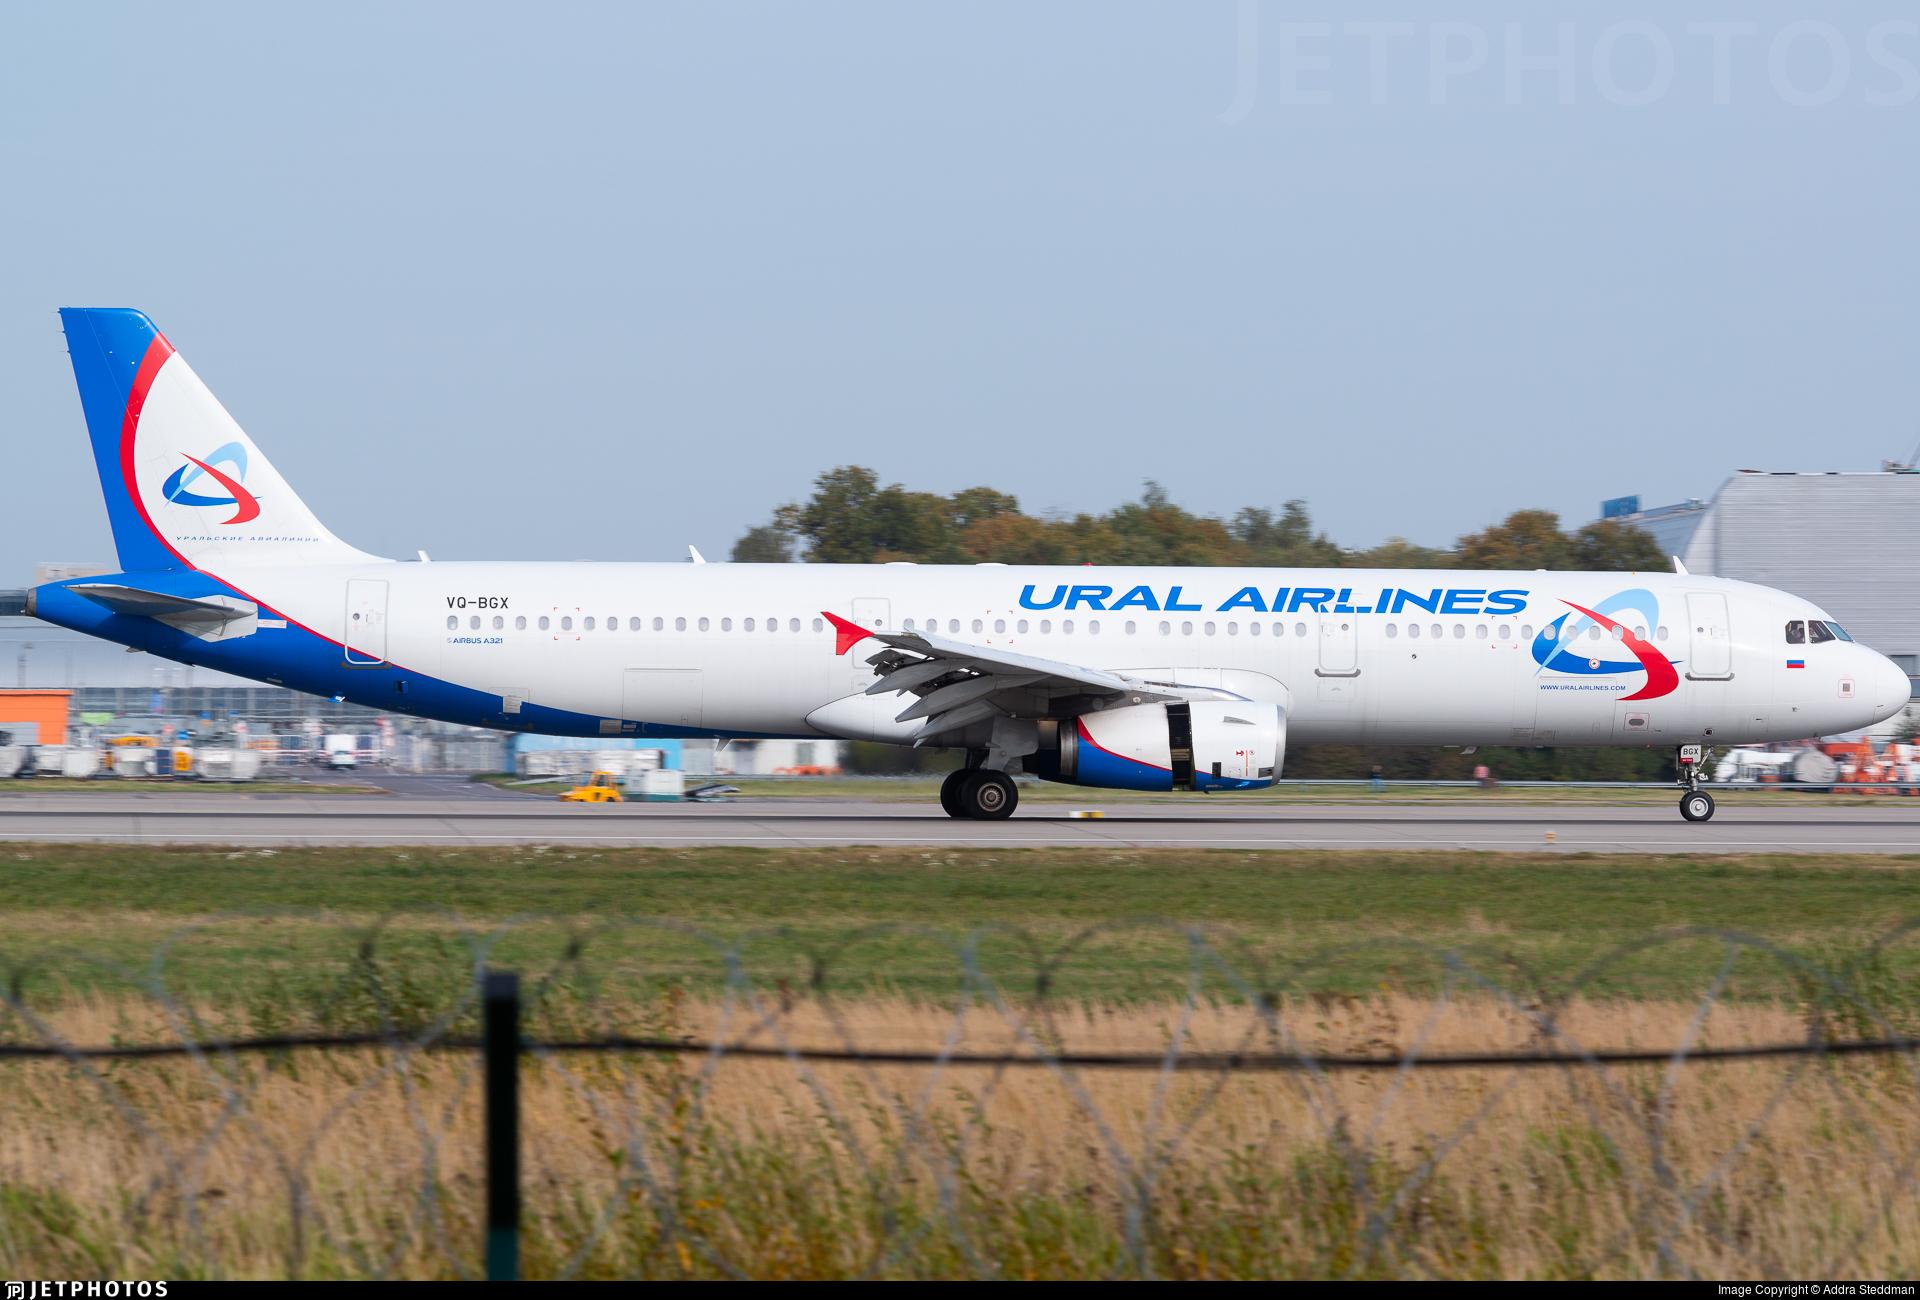 VQ-BGX - Airbus A321-231 - Ural Airlines